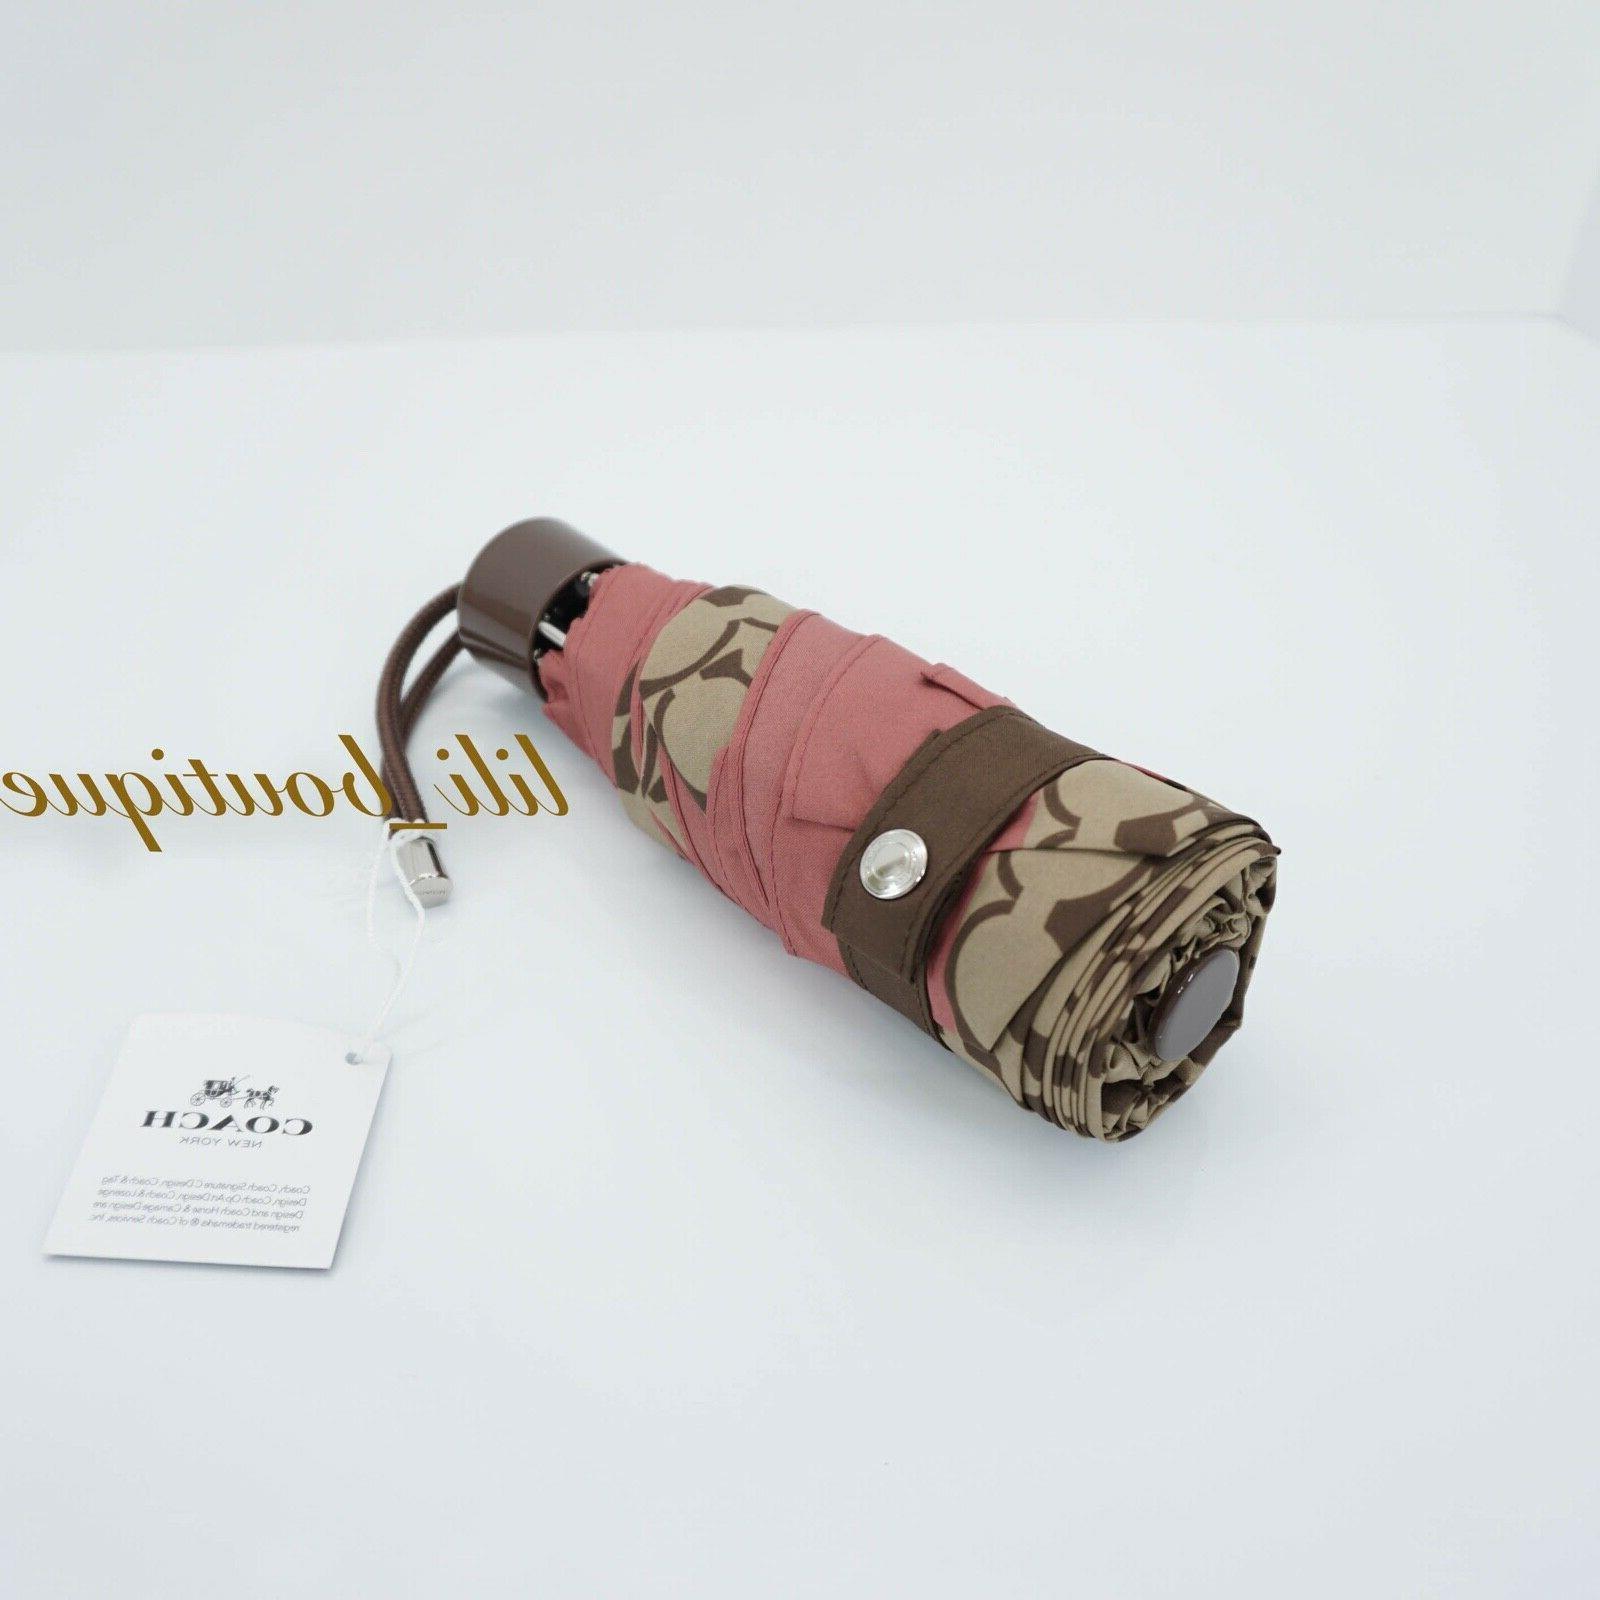 nwt new f63365 women signature mini umbrella